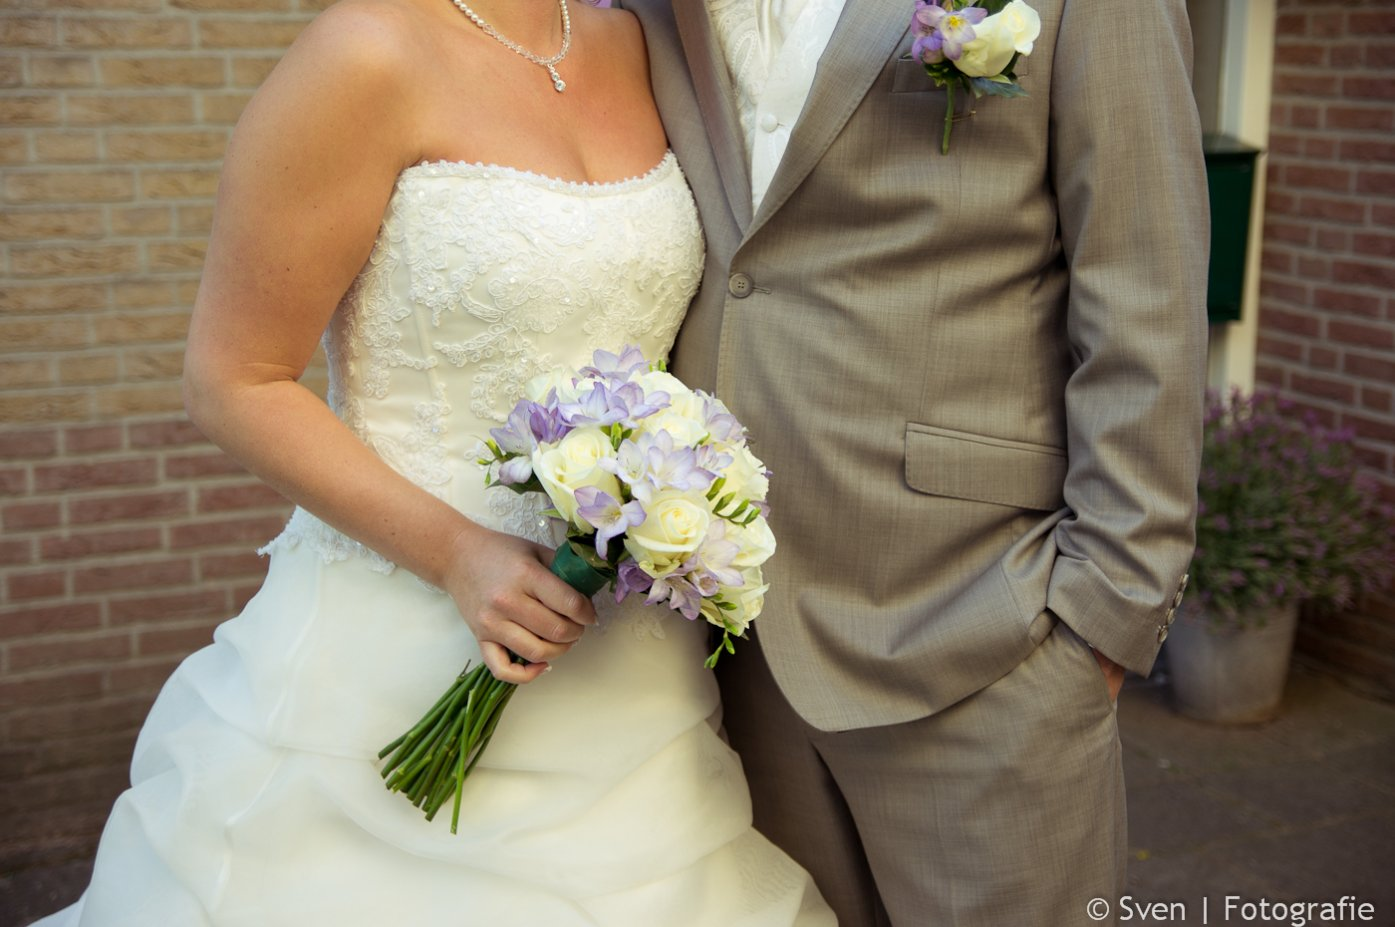 Trouwen Charissa en Mathijs,  sven, fotografie, bruiloft, trouwen, Almere, fotograaf